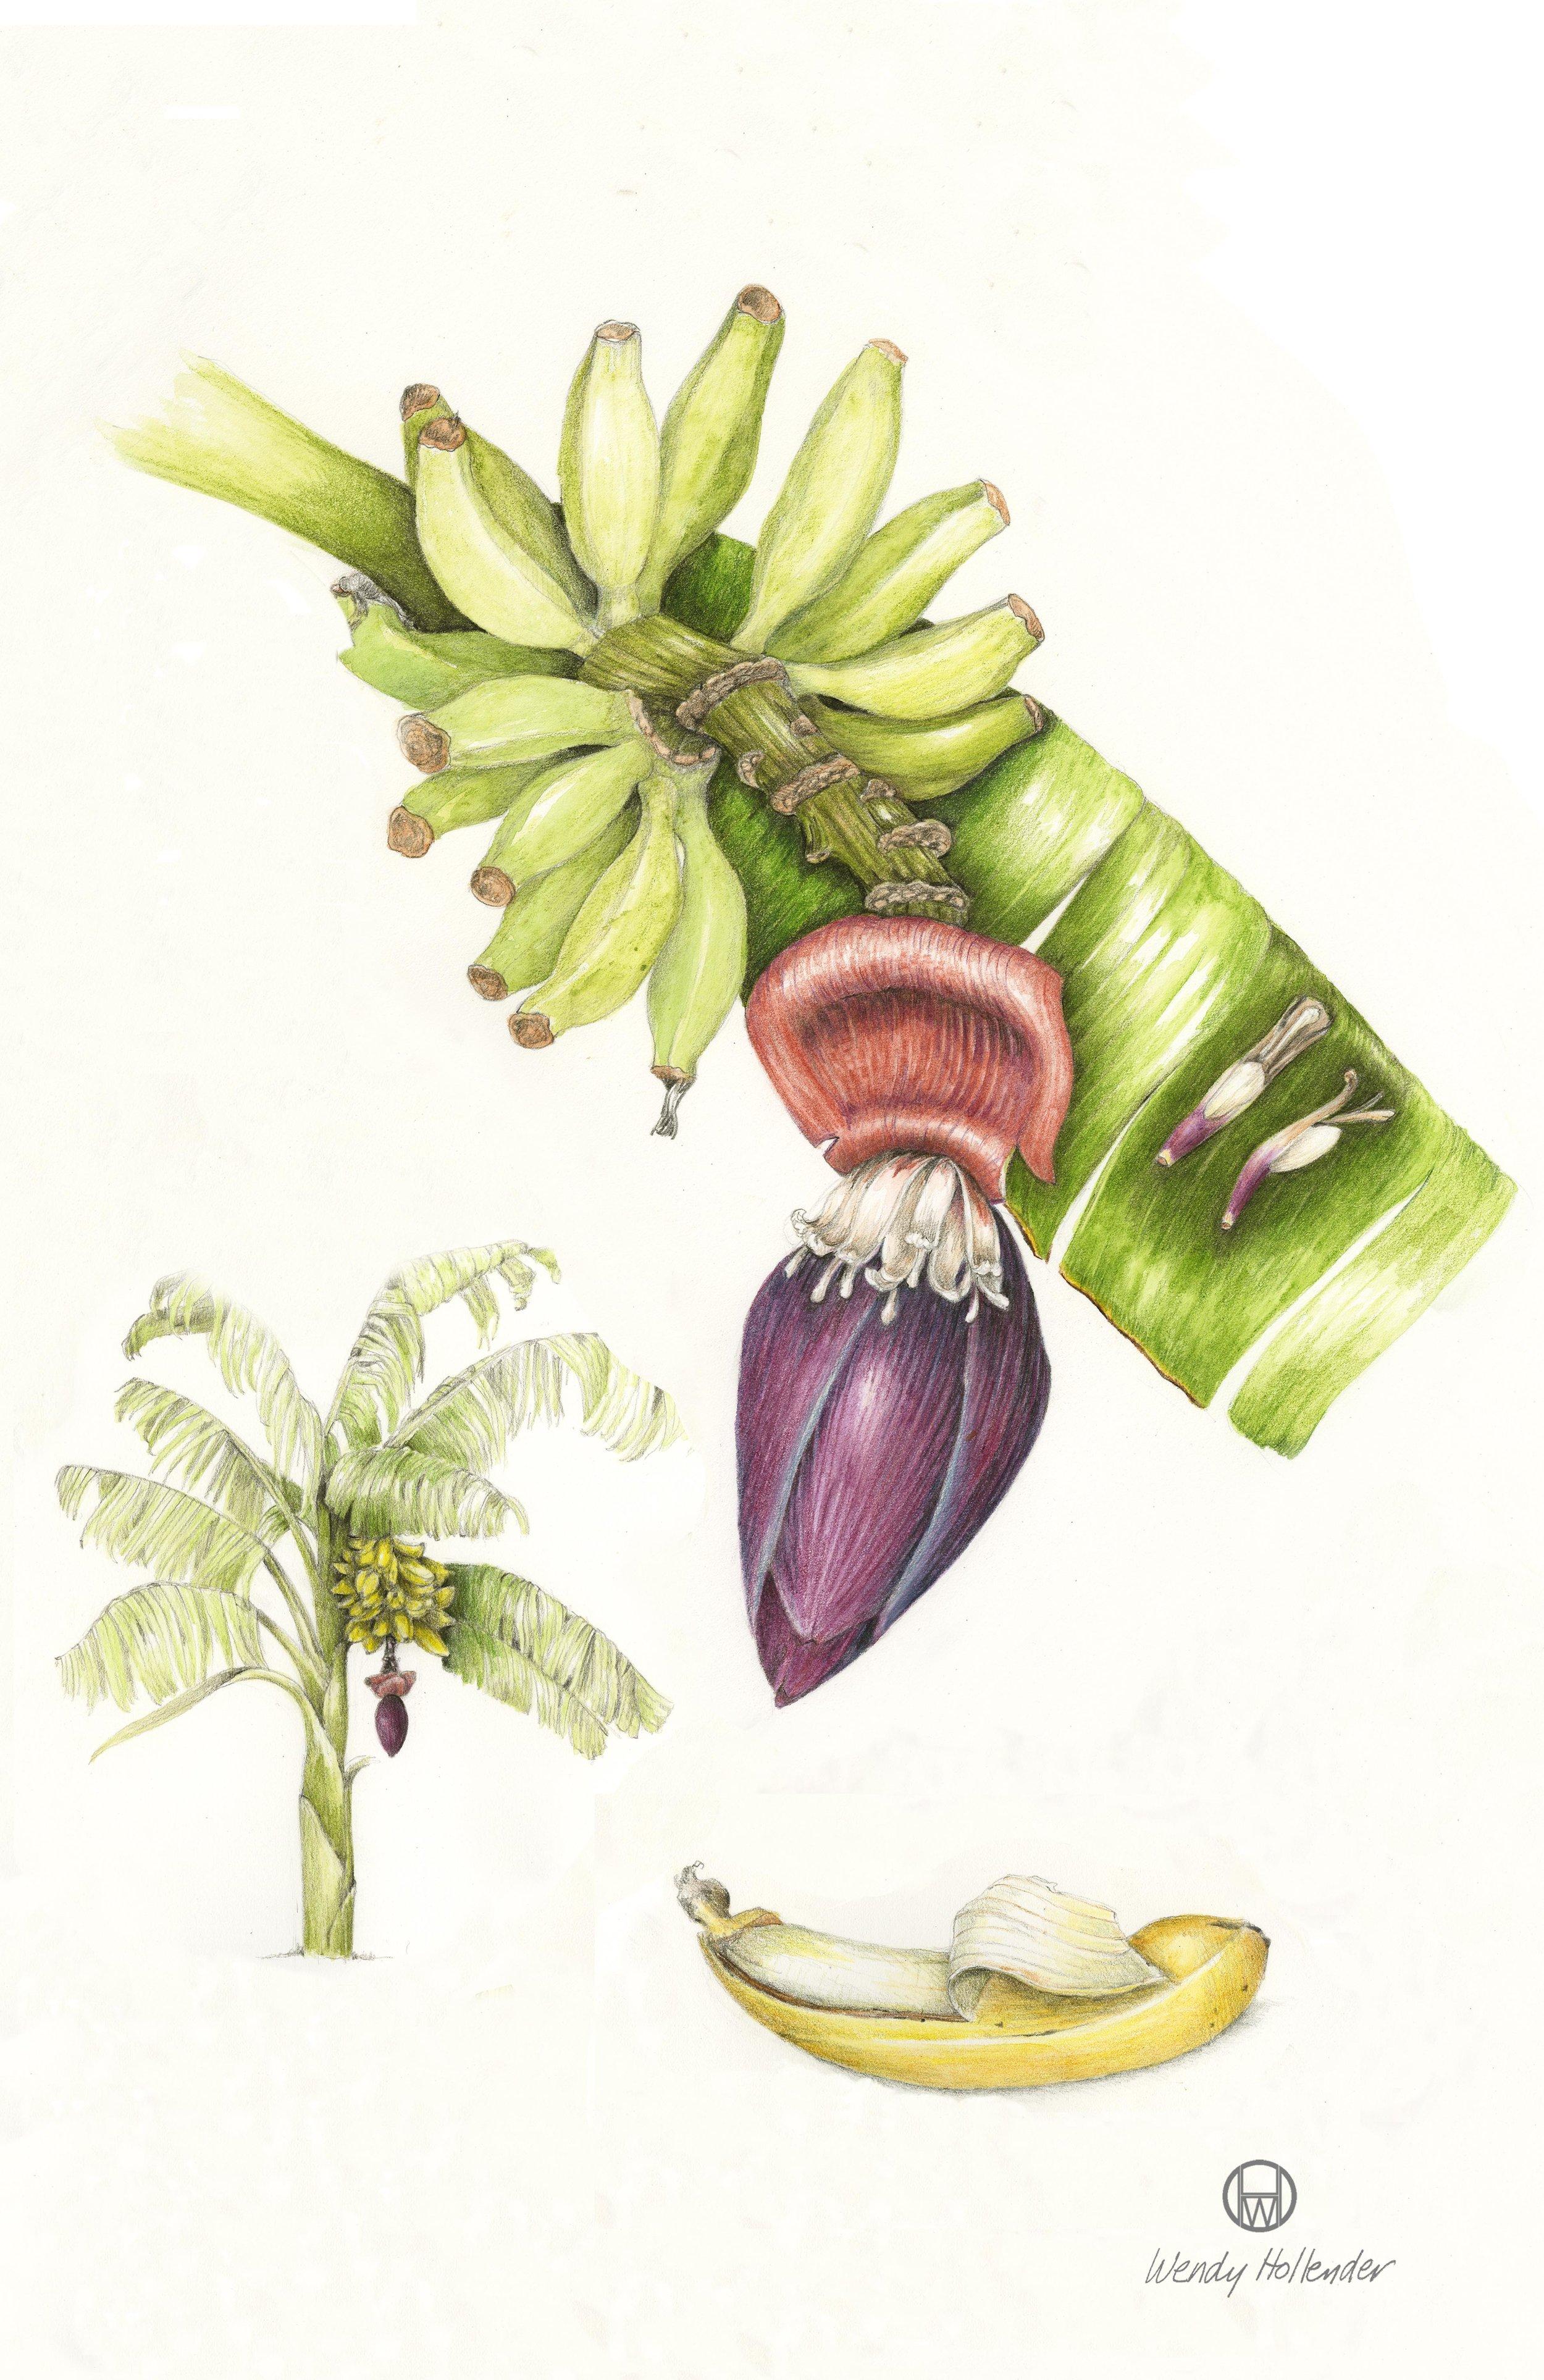 Banana - Musa acuminata